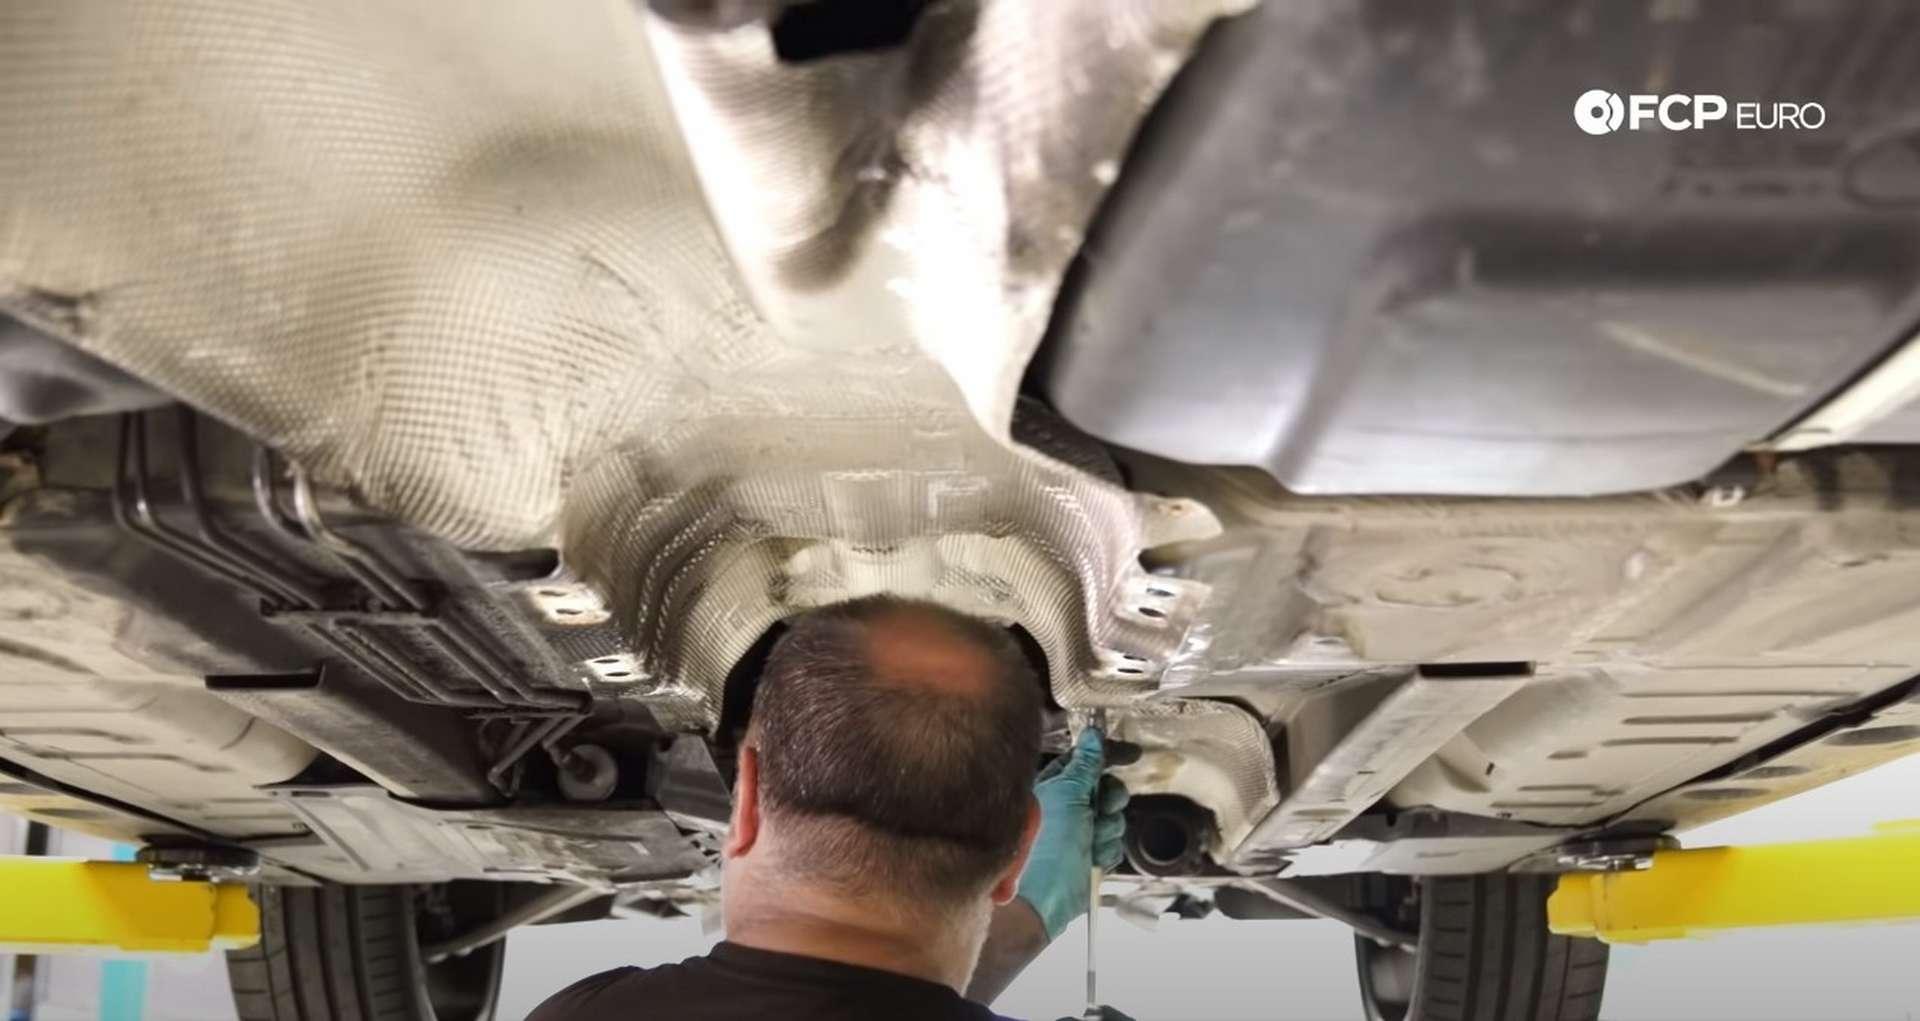 DIY E46 BMW M3 Rear Subframe Refresh Part 3 refitting the exhaust heat shield